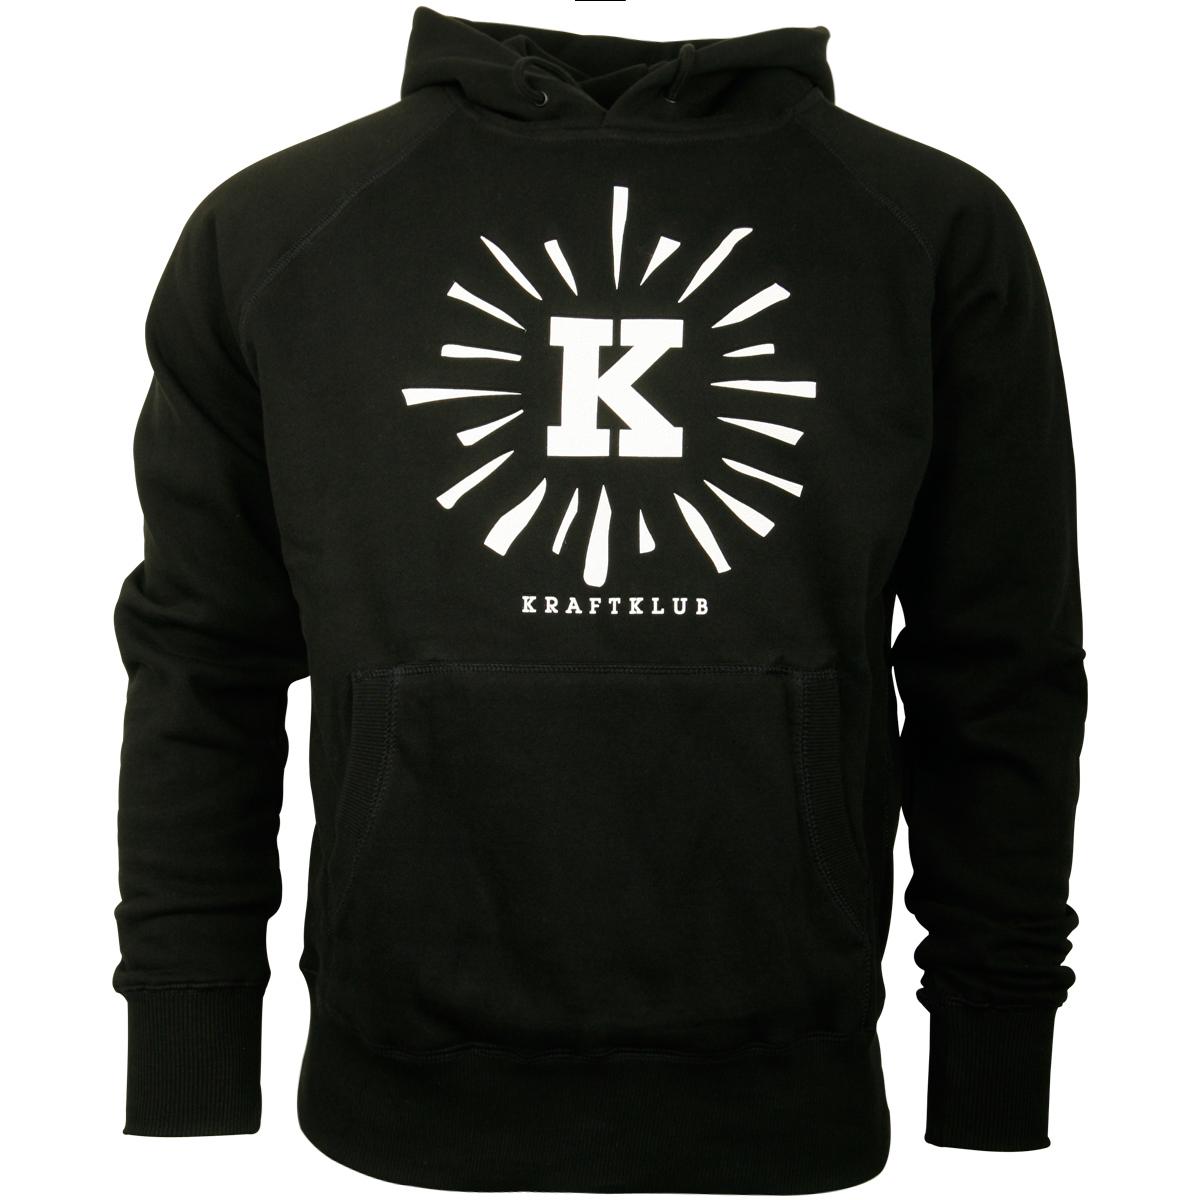 Kraftklub - Kapuzenpullover Leuchtendes K - schwarz